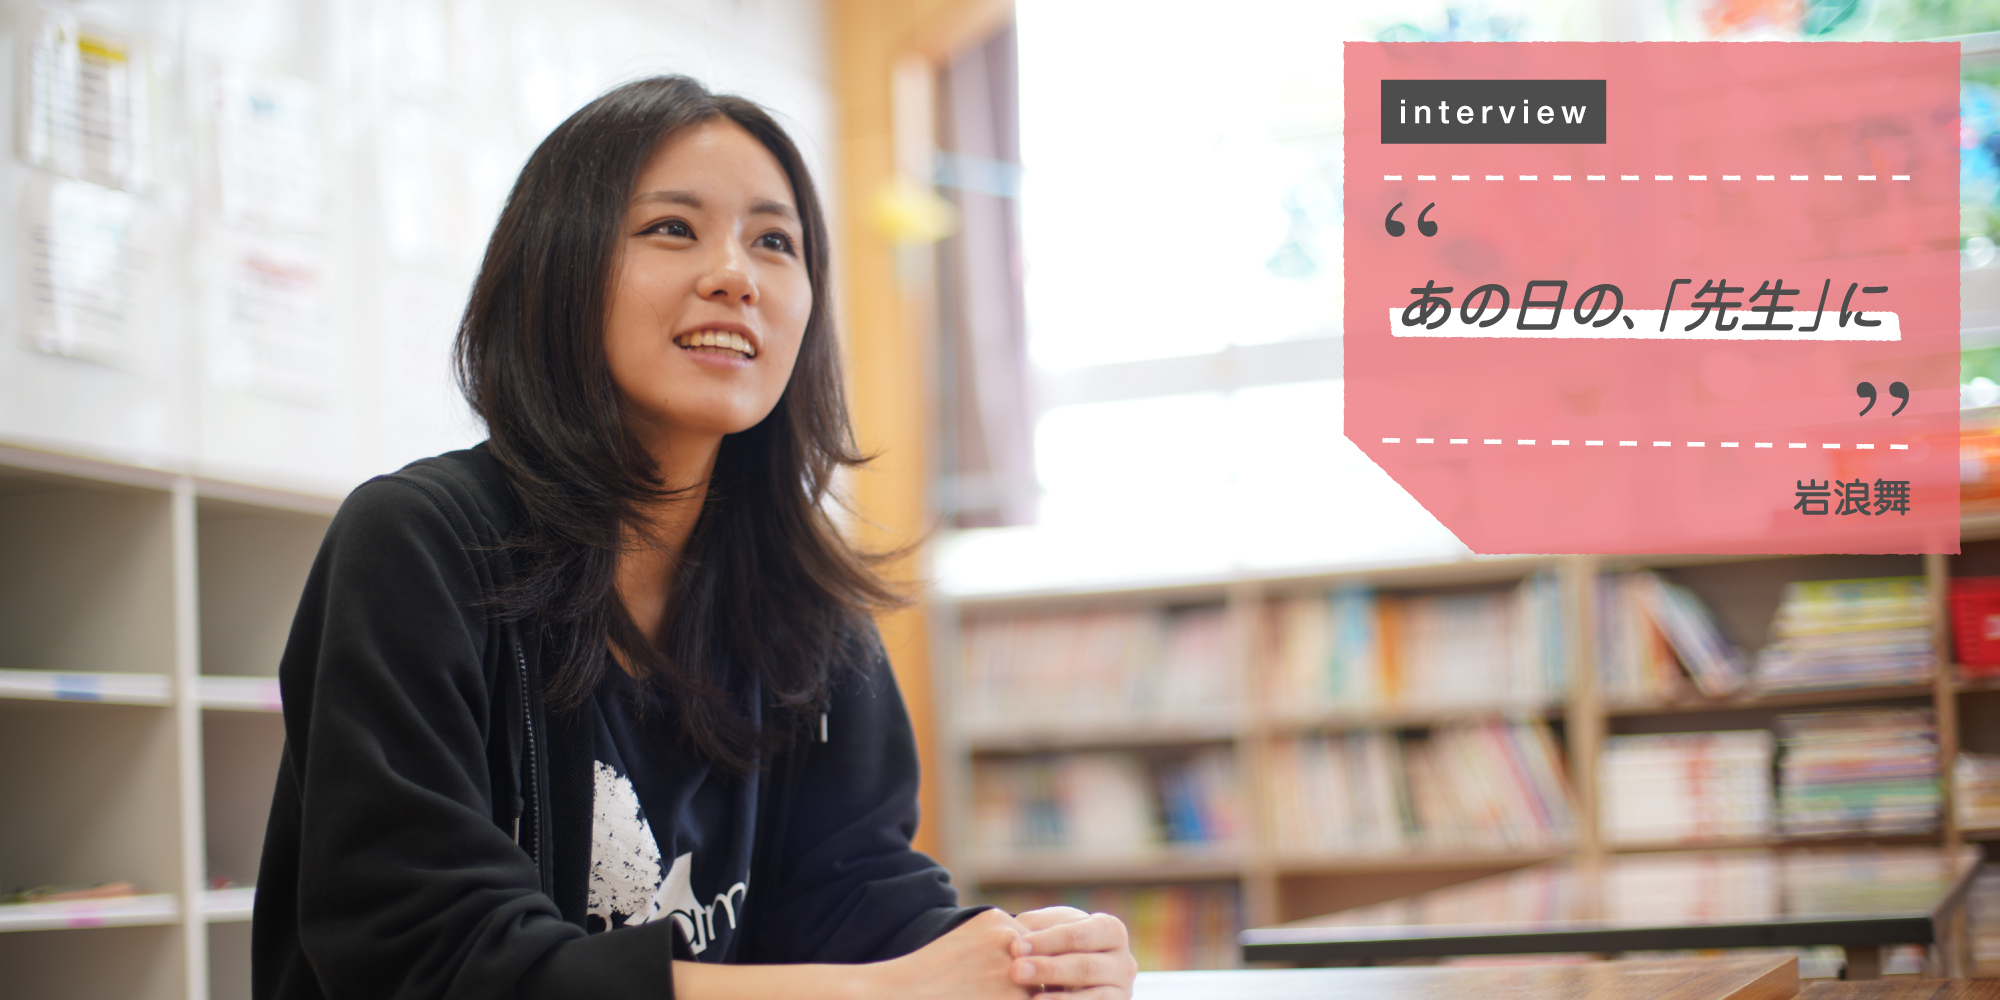 2019chigasaki_interview_02_01.jpg